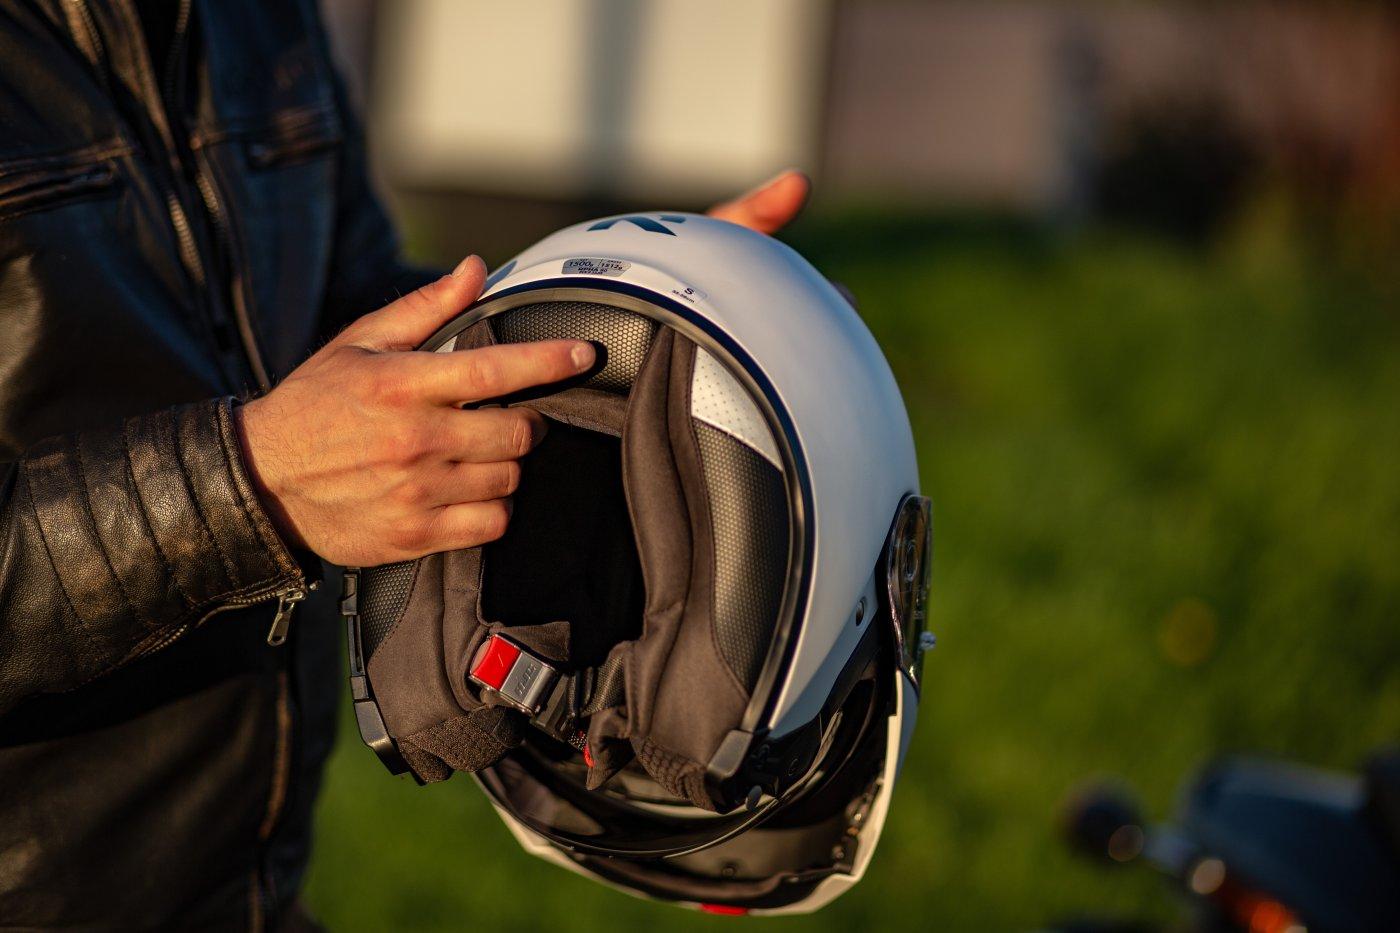 HJC RPHA 90 test motormania (13) fot 64deg